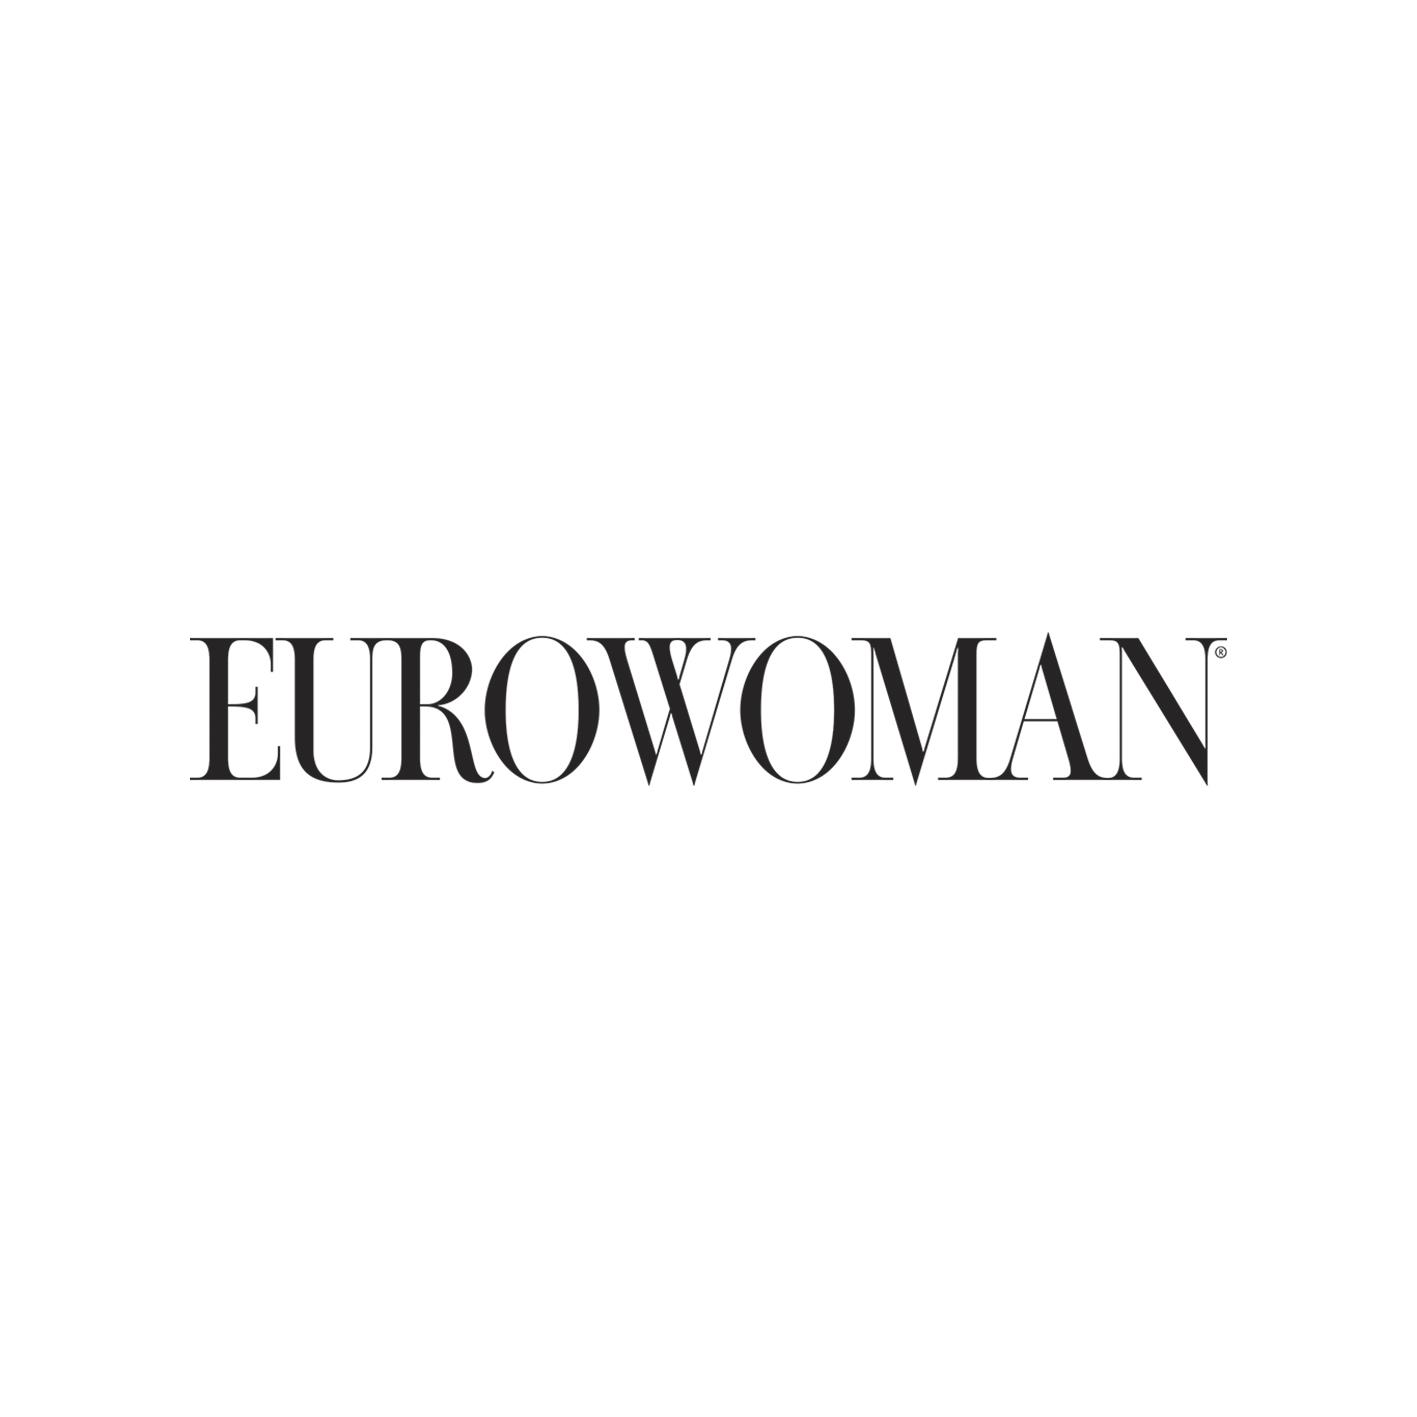 Eurowoman logo